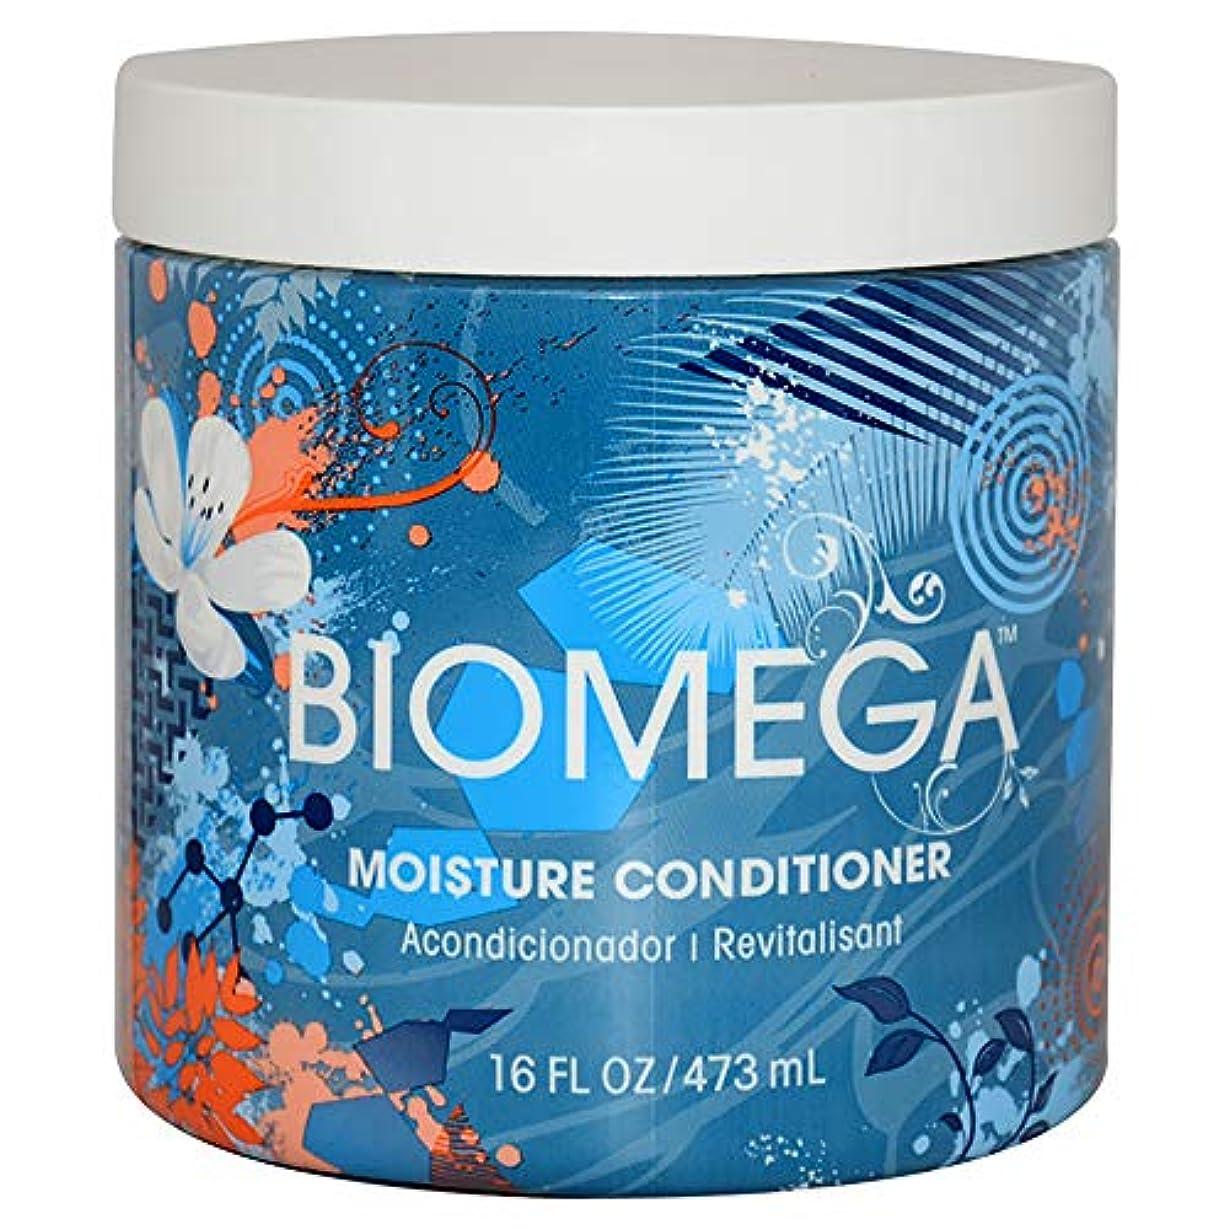 Biomega モイスチャーコンディショナー (16oz) [並行輸入品]